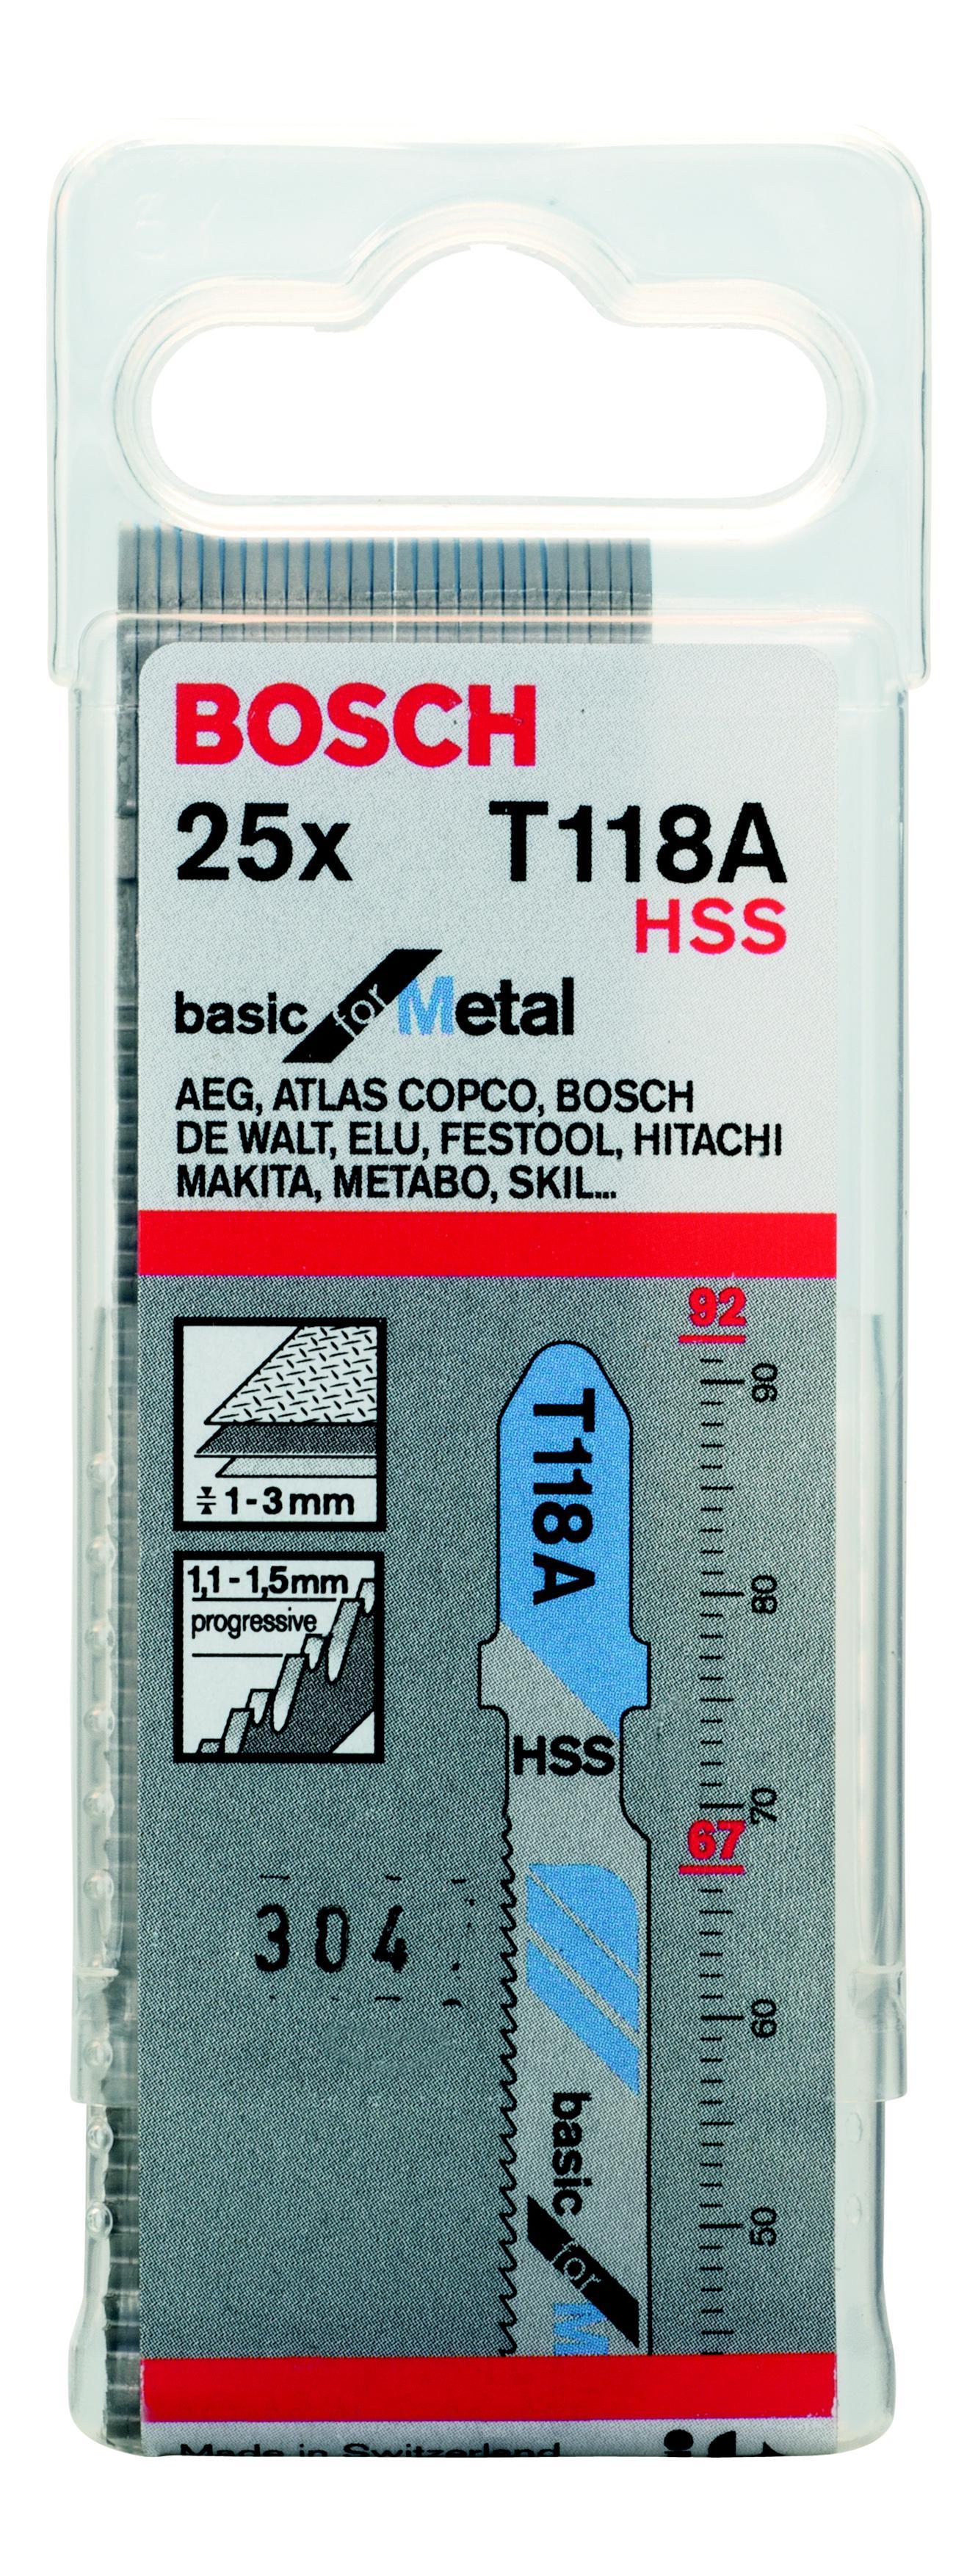 Пилки для лобзика Bosch 2608638470 пилки для лобзика bosch 2608637879